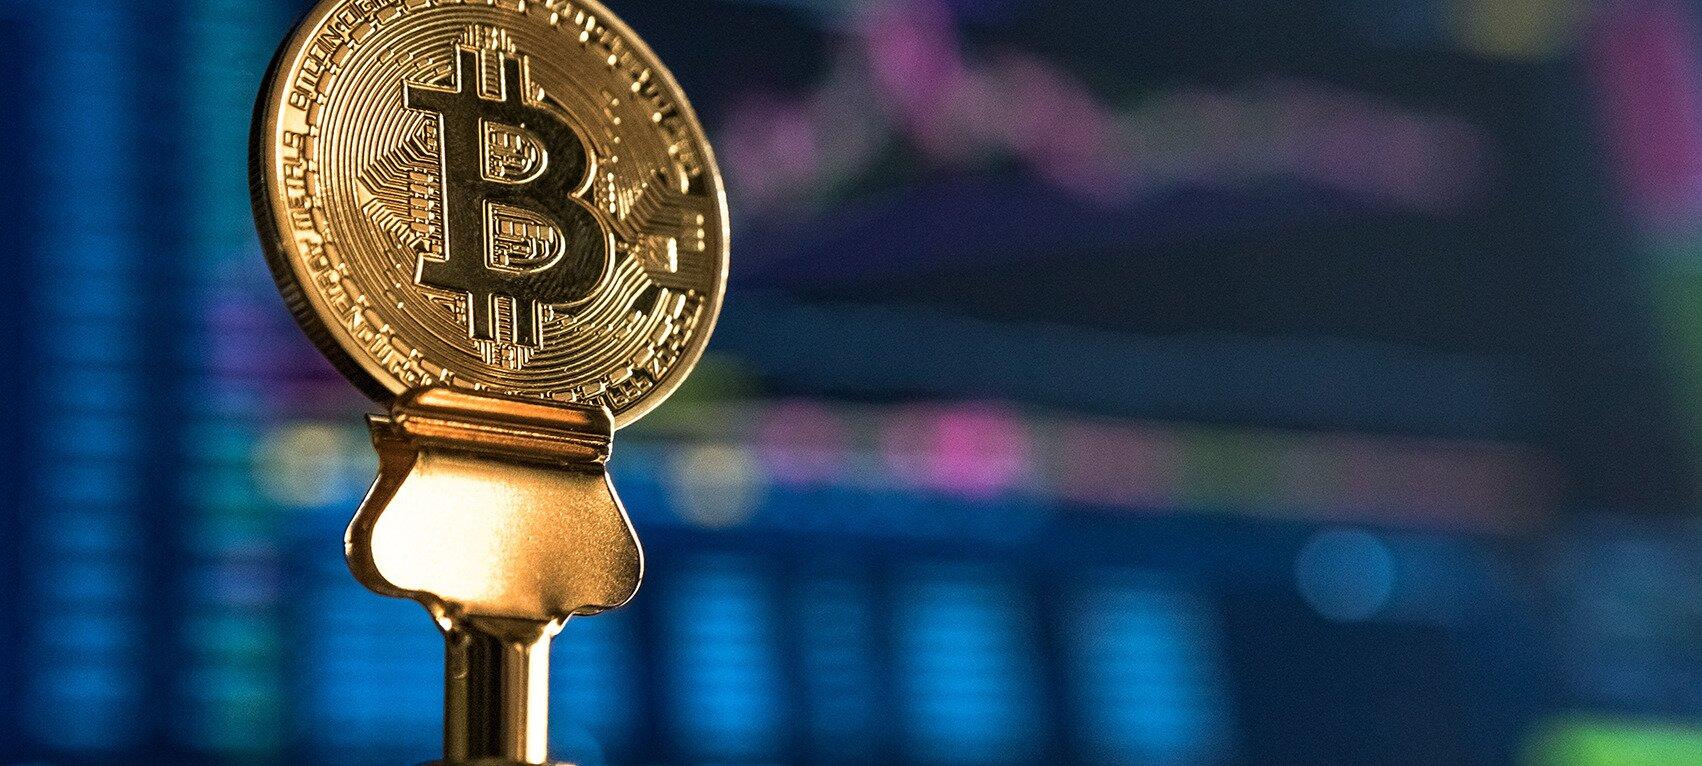 https://www.gambleonline.co/app/uploads/2021/04/bitcoin-betting.jpg